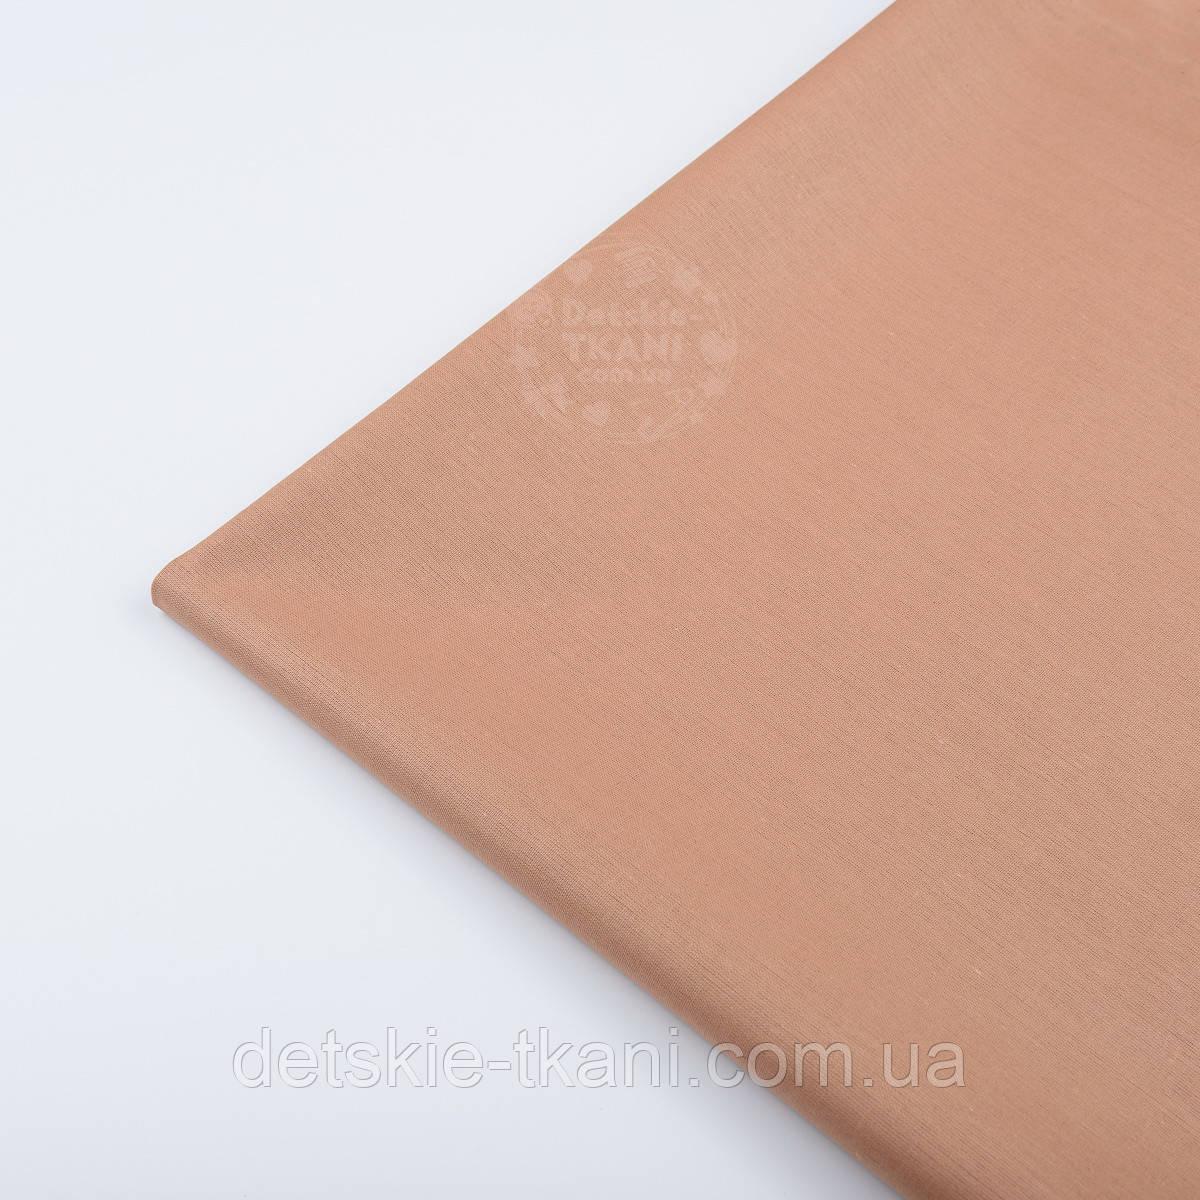 Лоскут ткани коричнево-медного цвета, №1249, размер 34*78 см